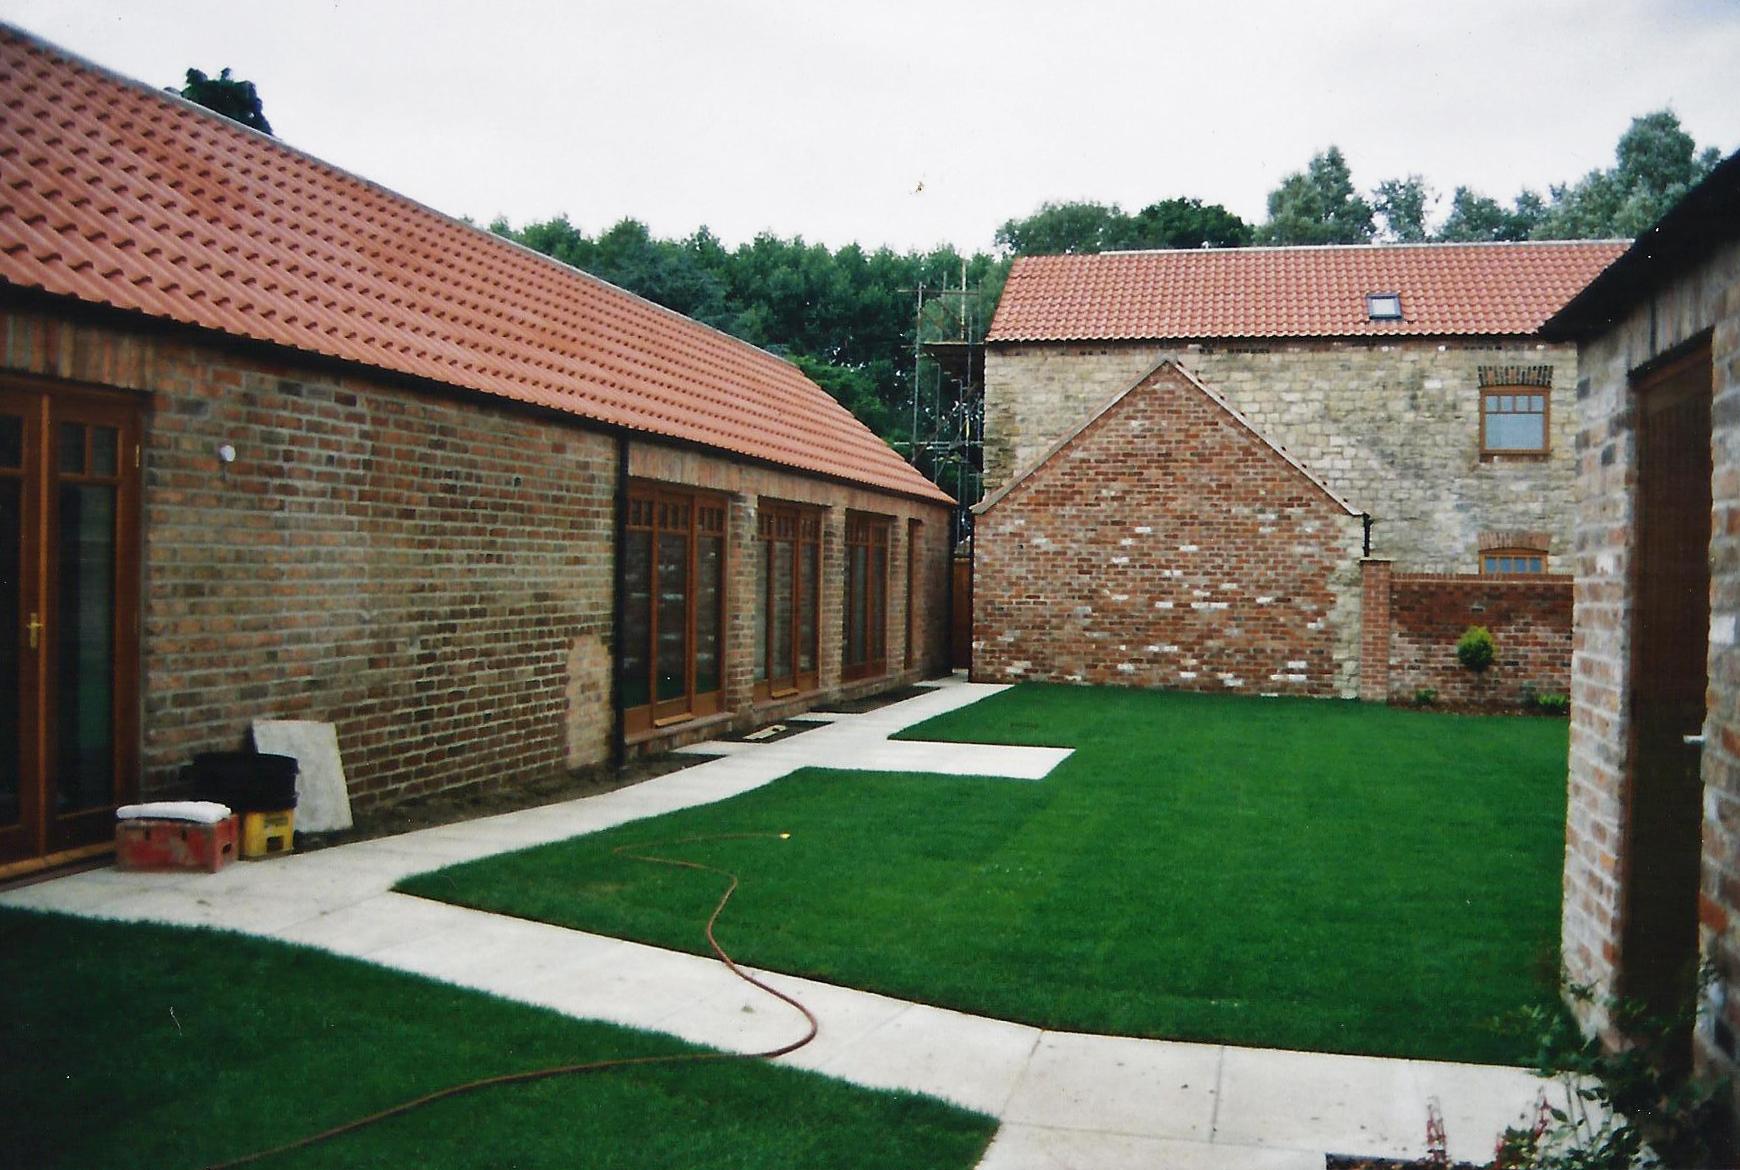 Brecks Farm Construction 2 - East Yorkshire Architects - Samuel Kendall Associates.jpg